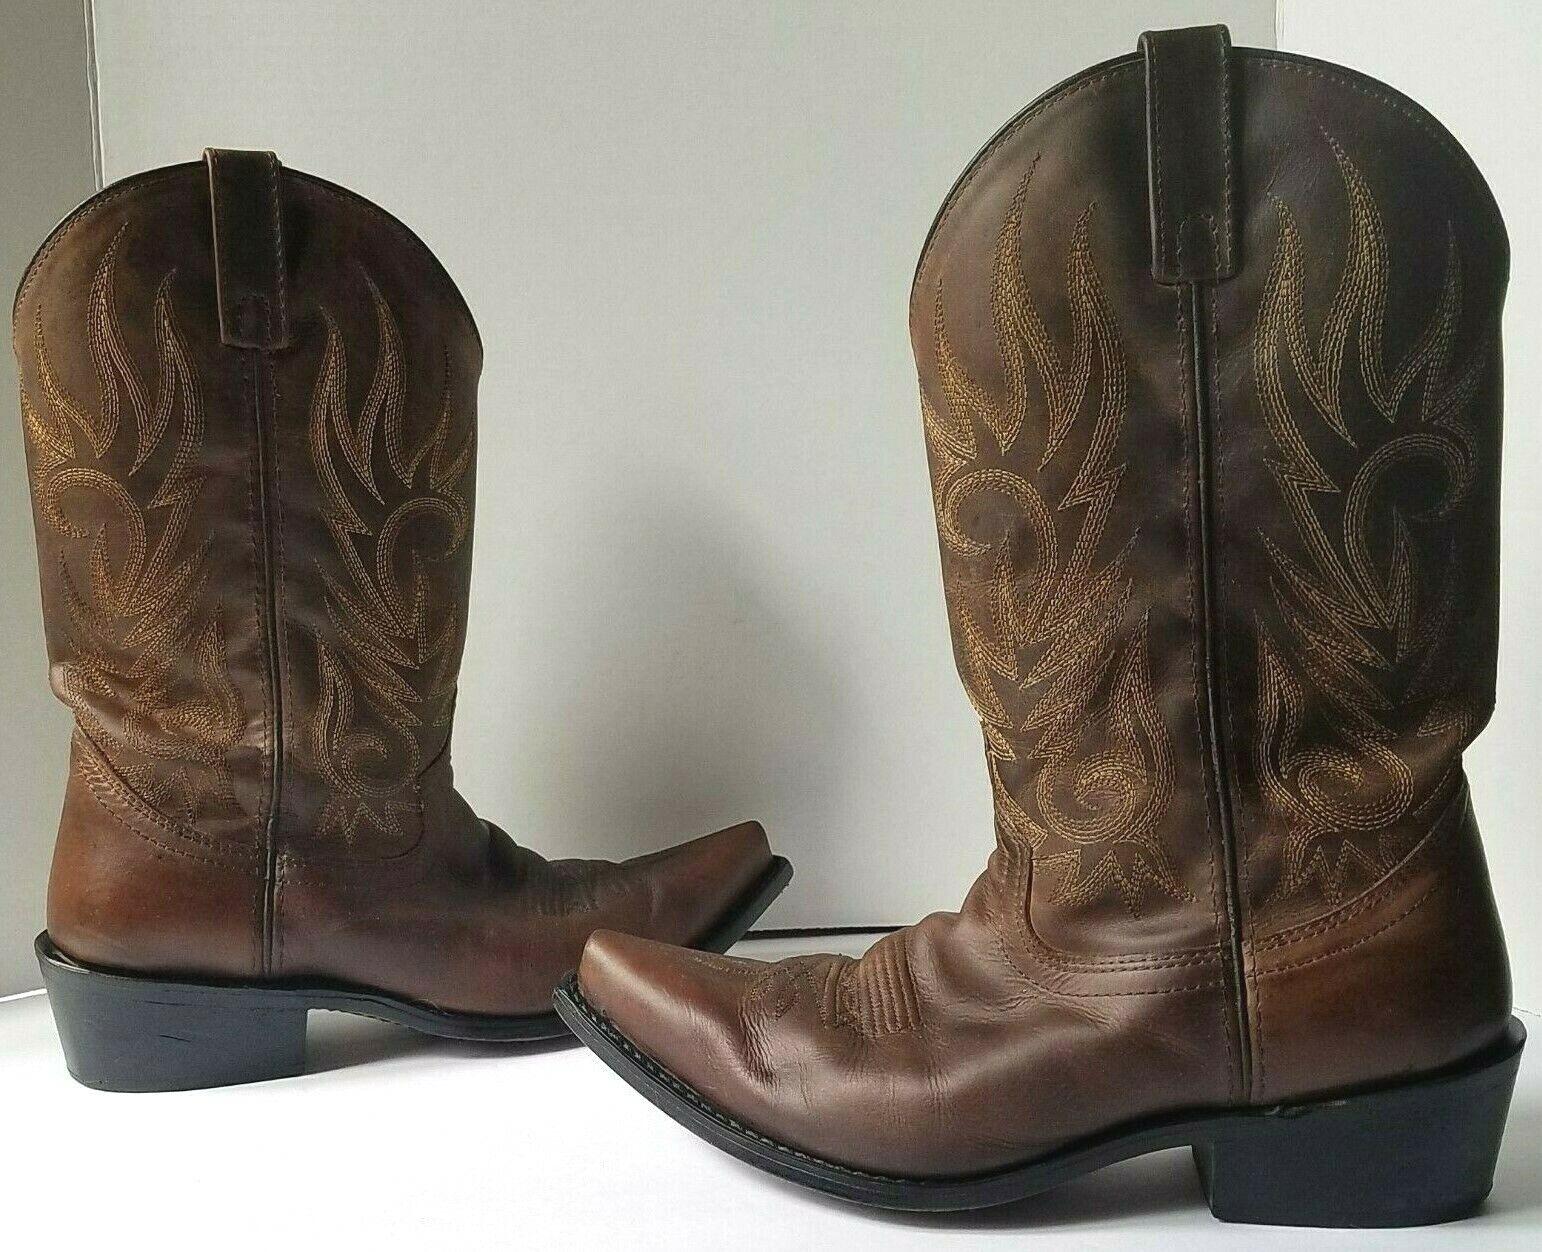 Laredo Men's 8.5 68424 Willow Creek Cowboy Boot Brown   Tan Crazy Horse Leather